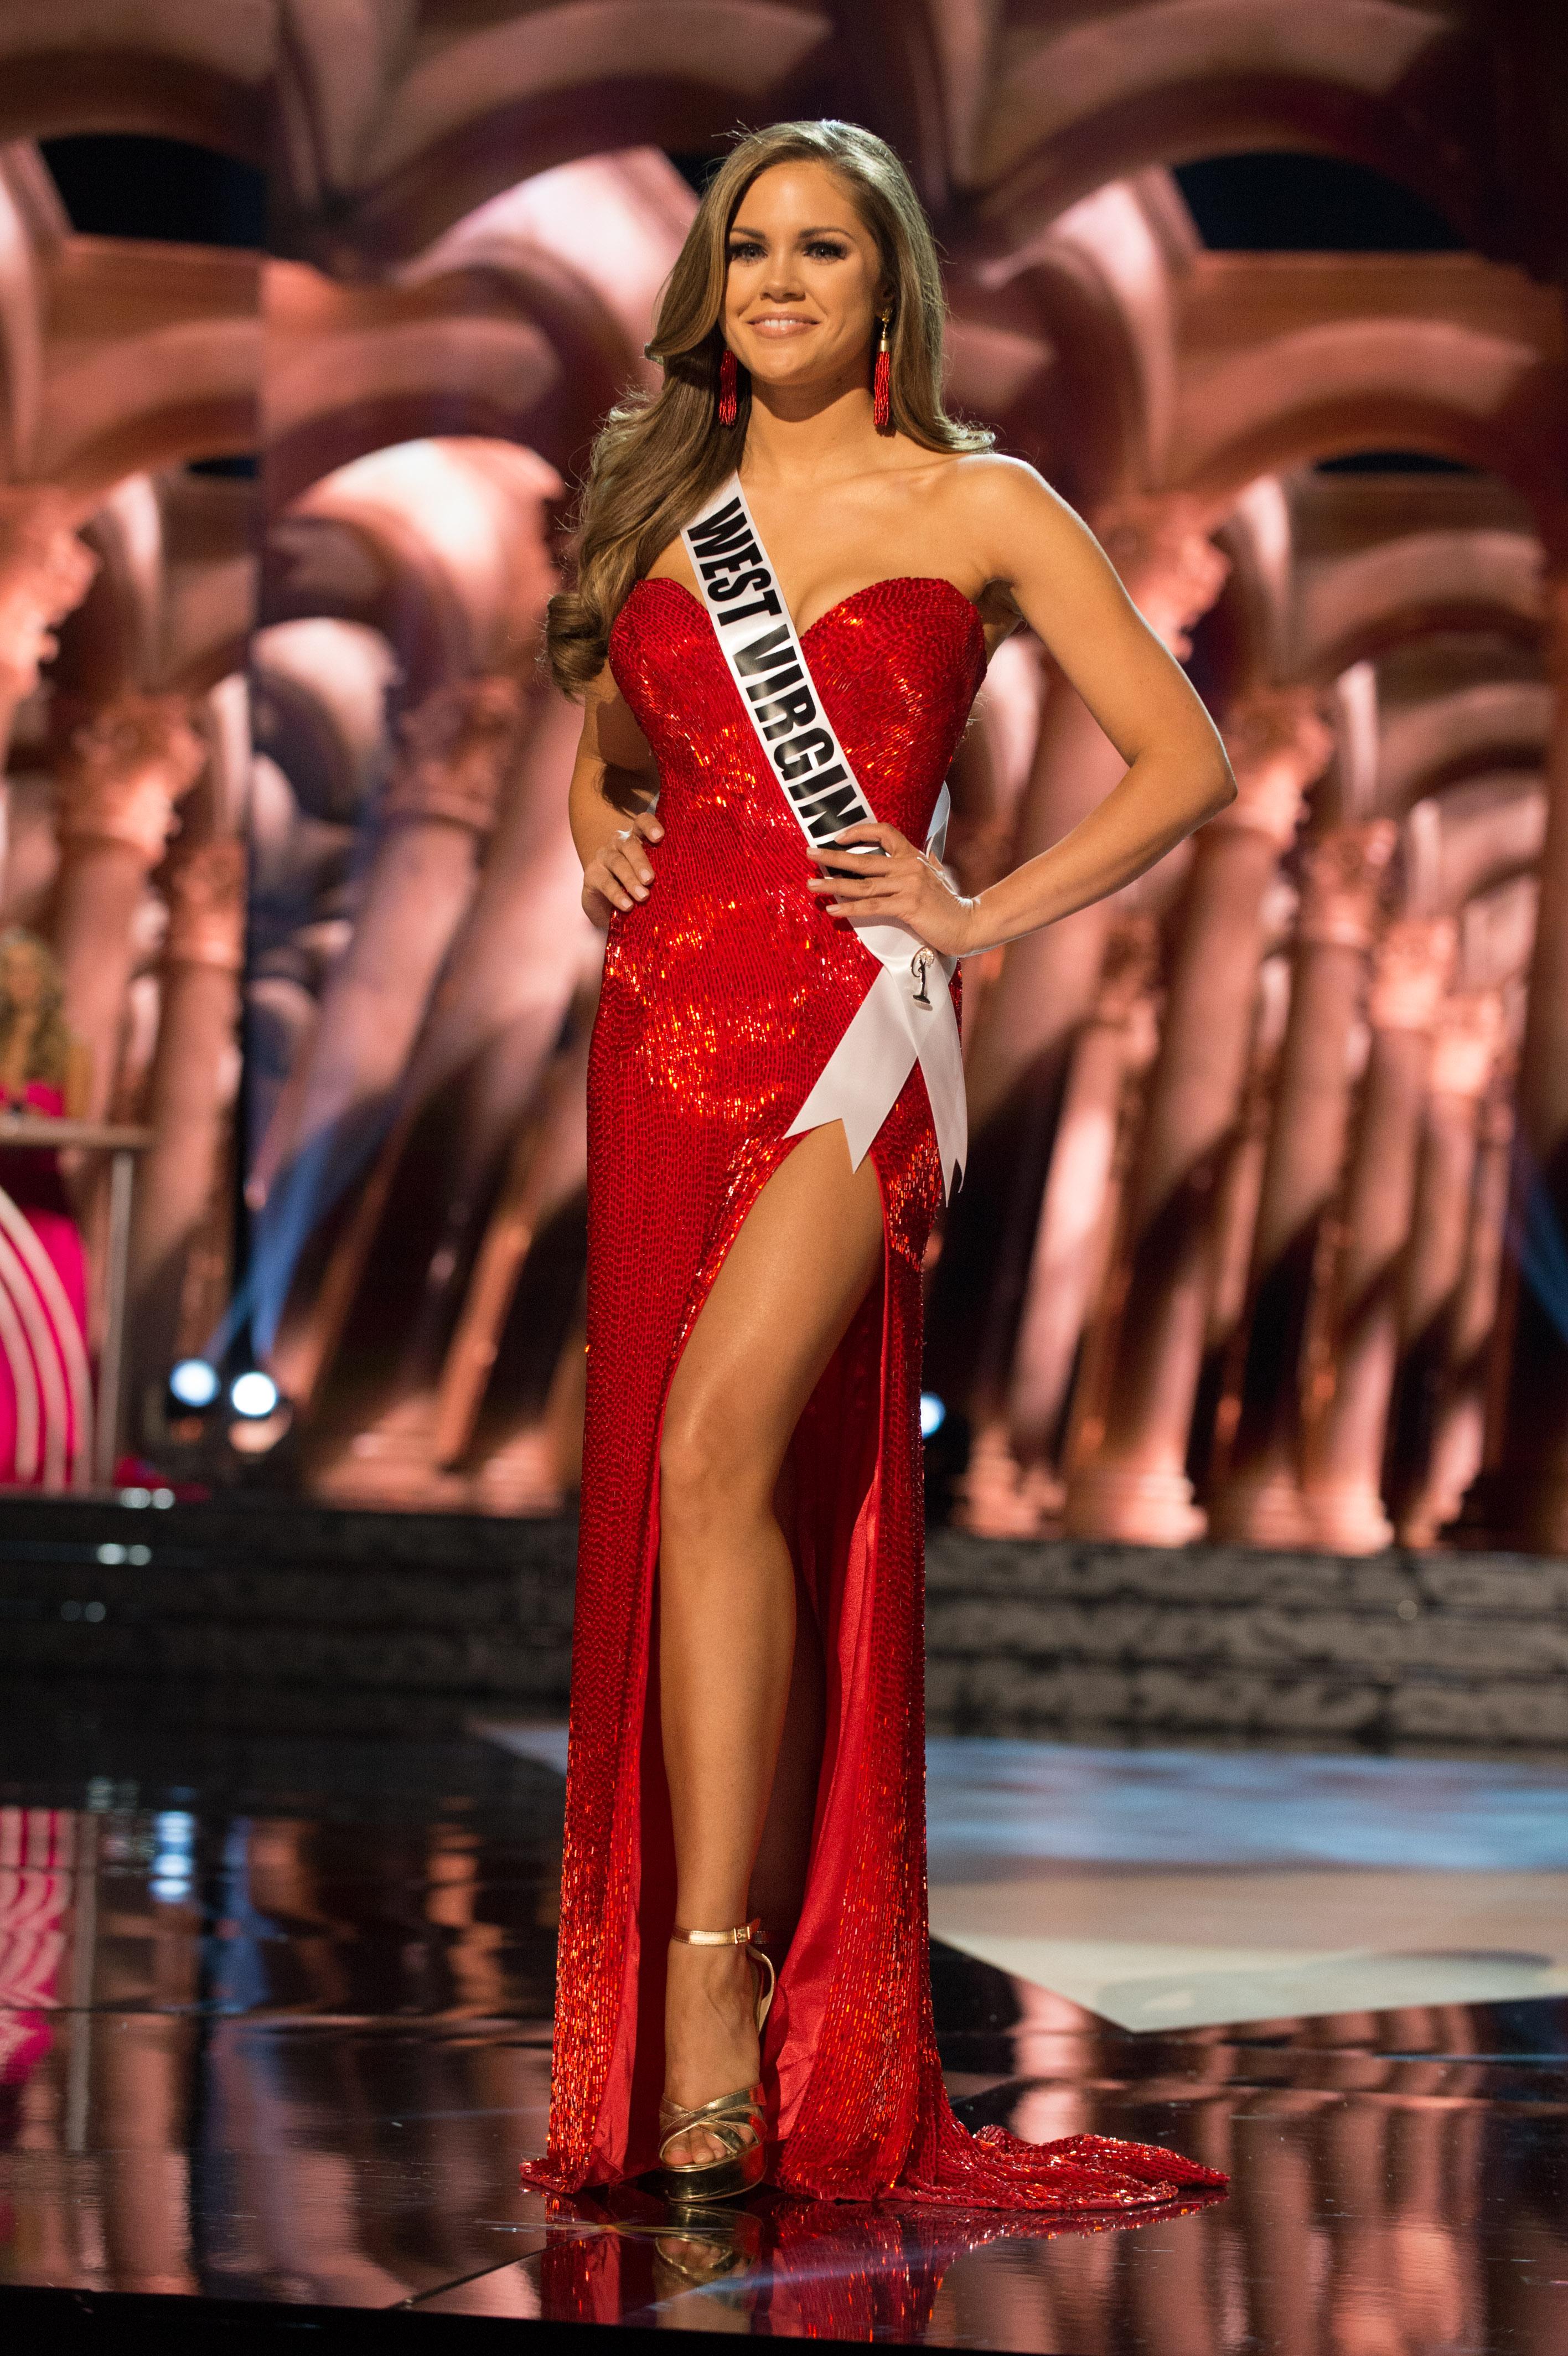 miss usa chinese laundry heels bikini evening gown